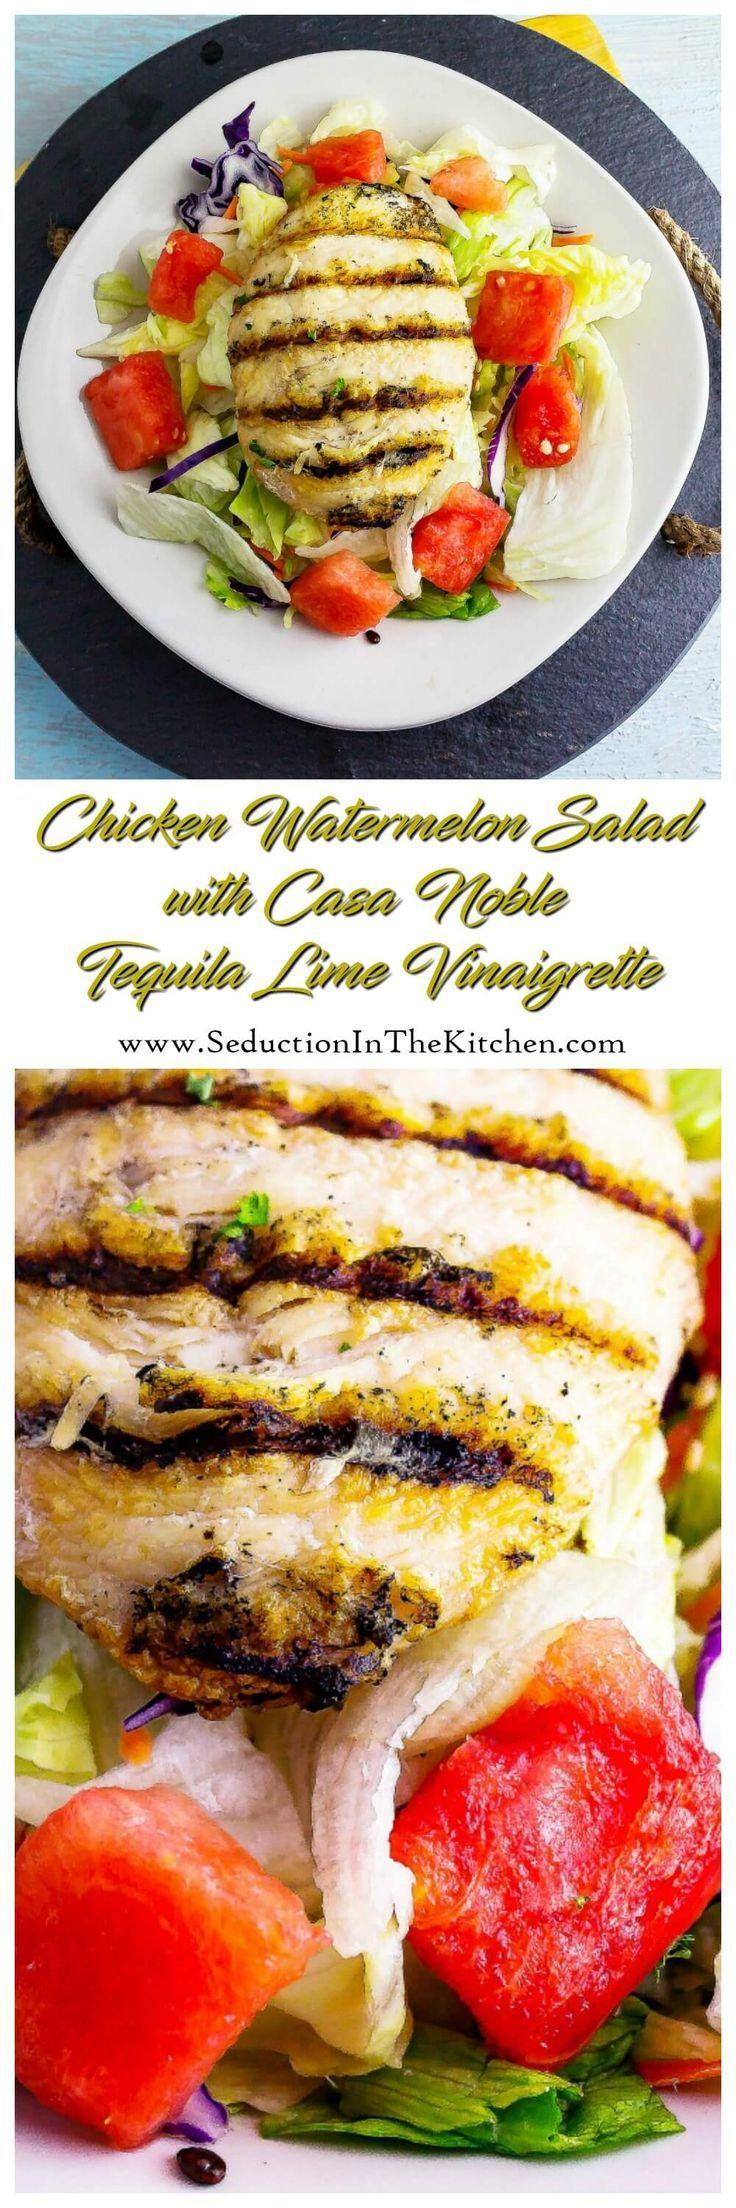 Chicken Watermelon Salad with Casa Noble Tequila Lime Vinaigrette is a healthy salad that features Casa Noble Tequila in a vinaigrette that is wonderful via @SeductionRecipe